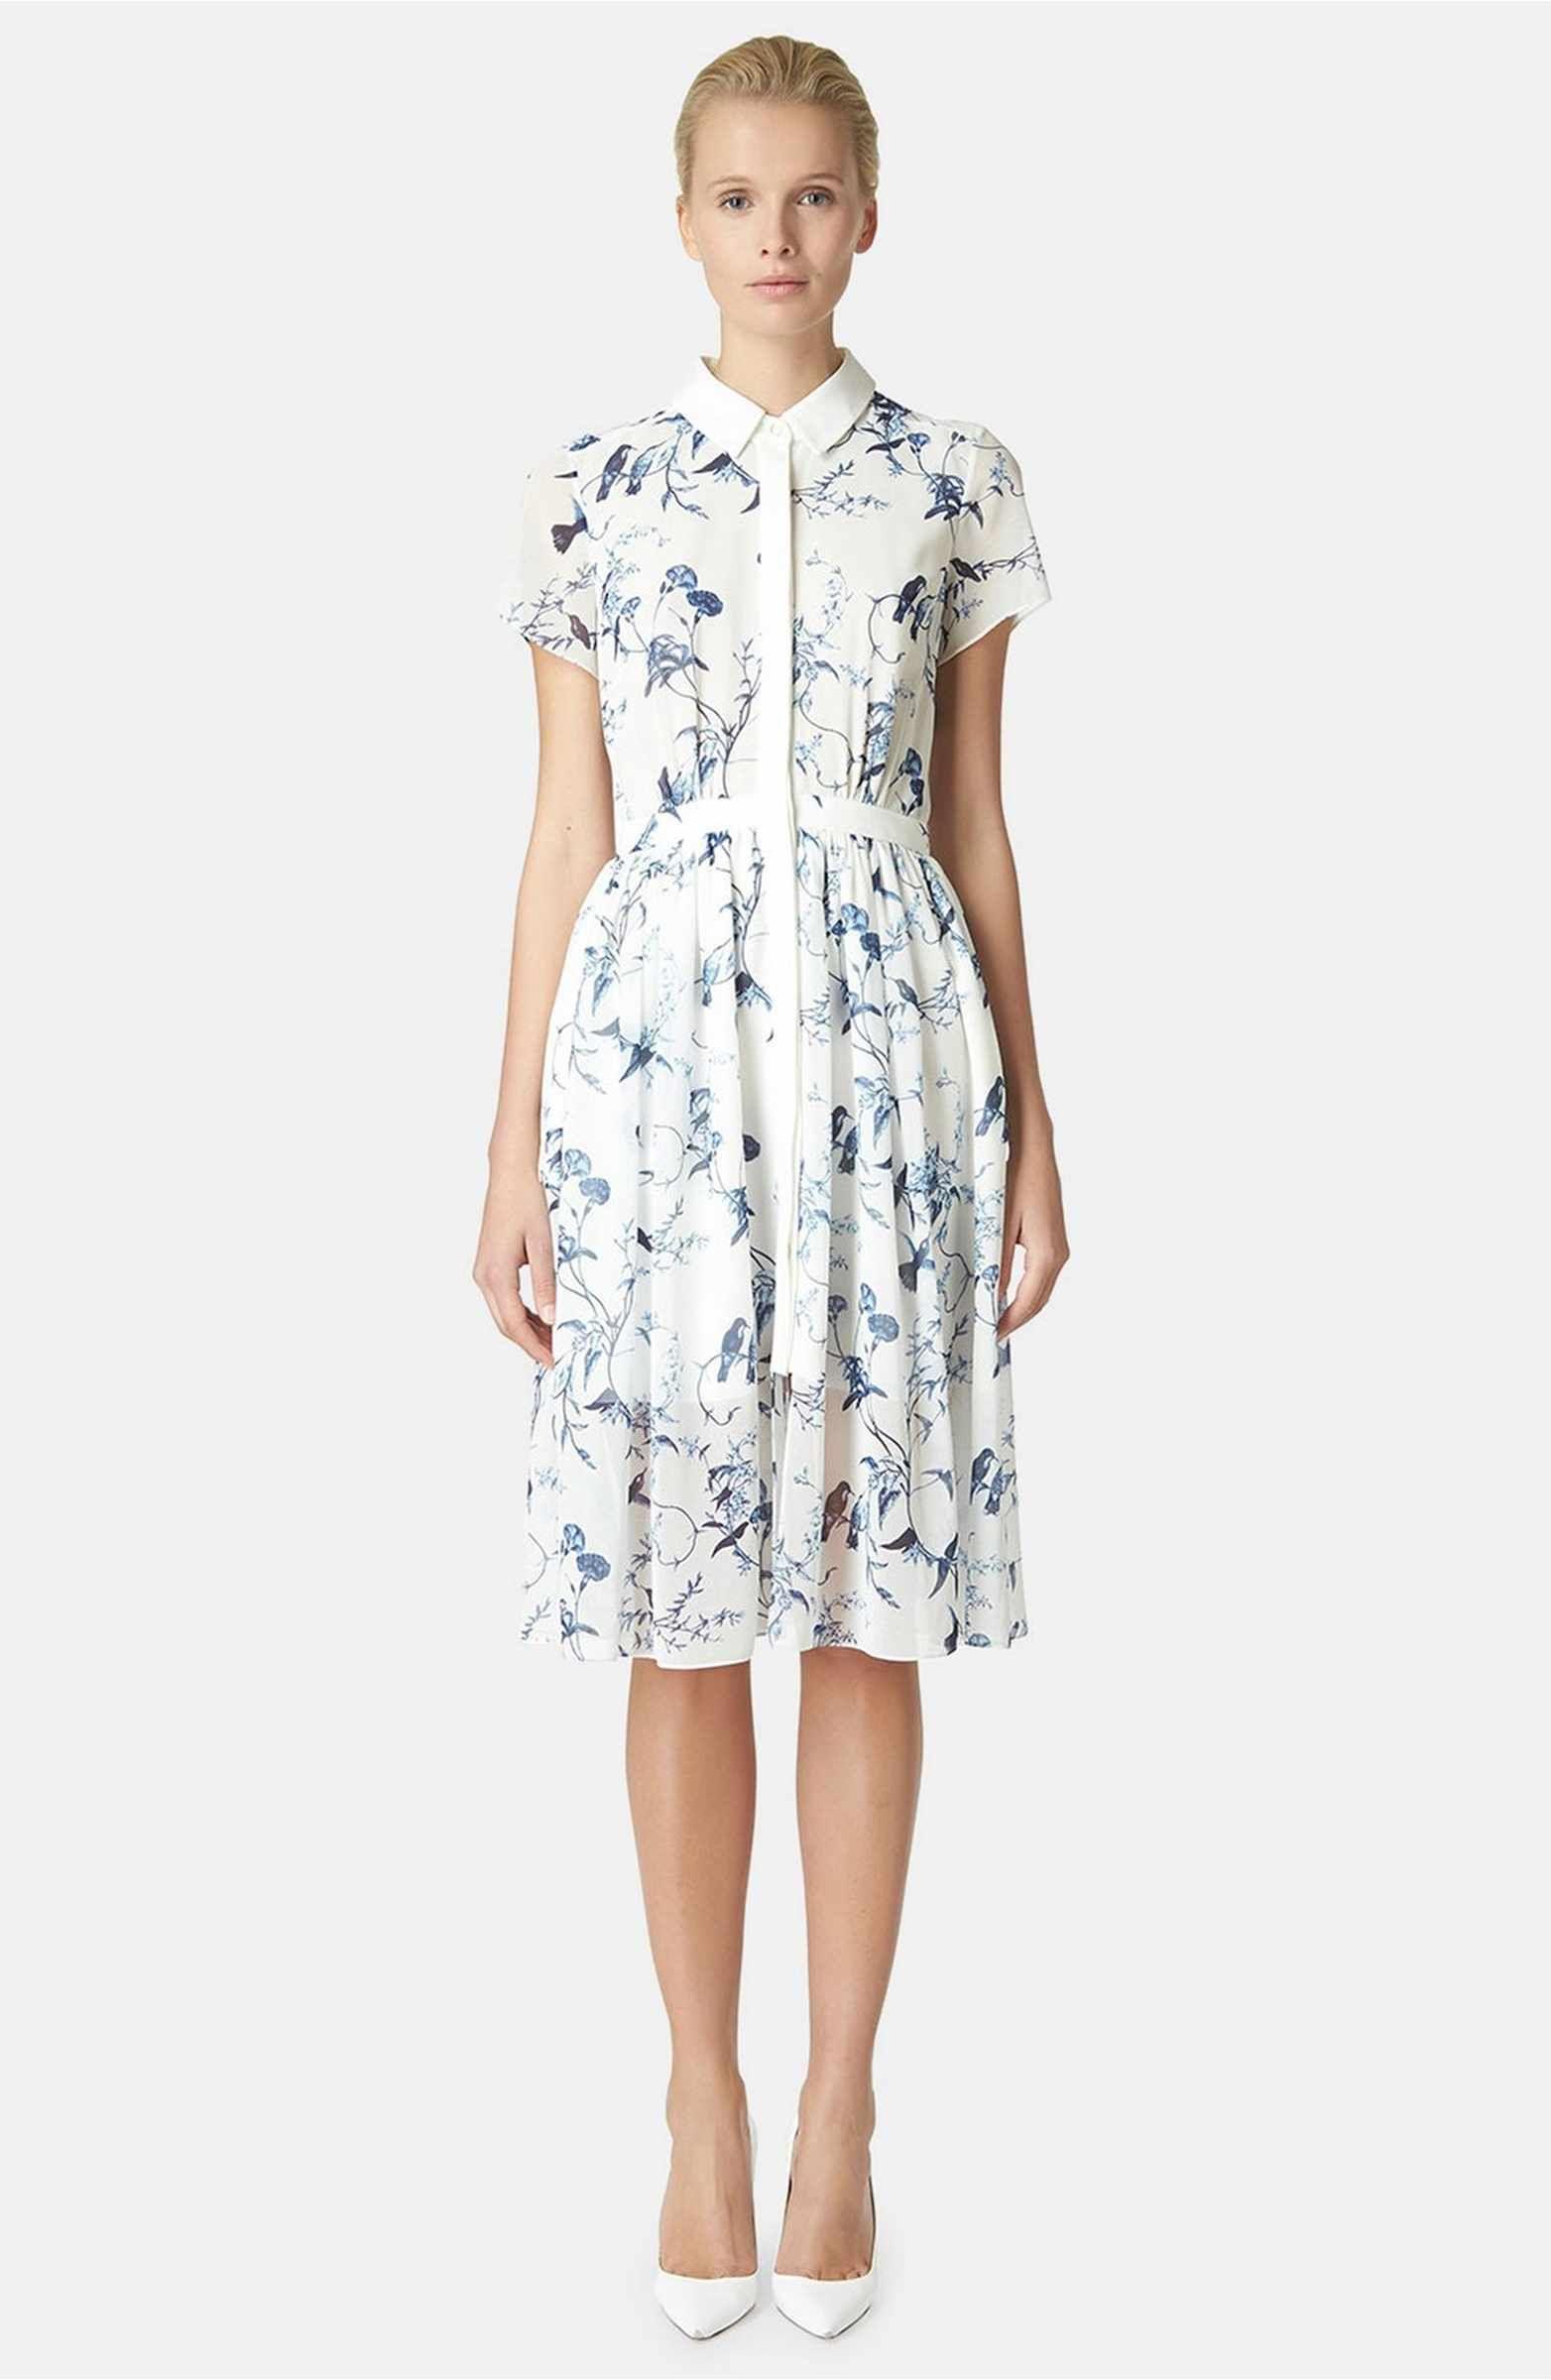 353e606fe90 Main Image - ERIN erin fetherston  Colette  Chiffon Dress